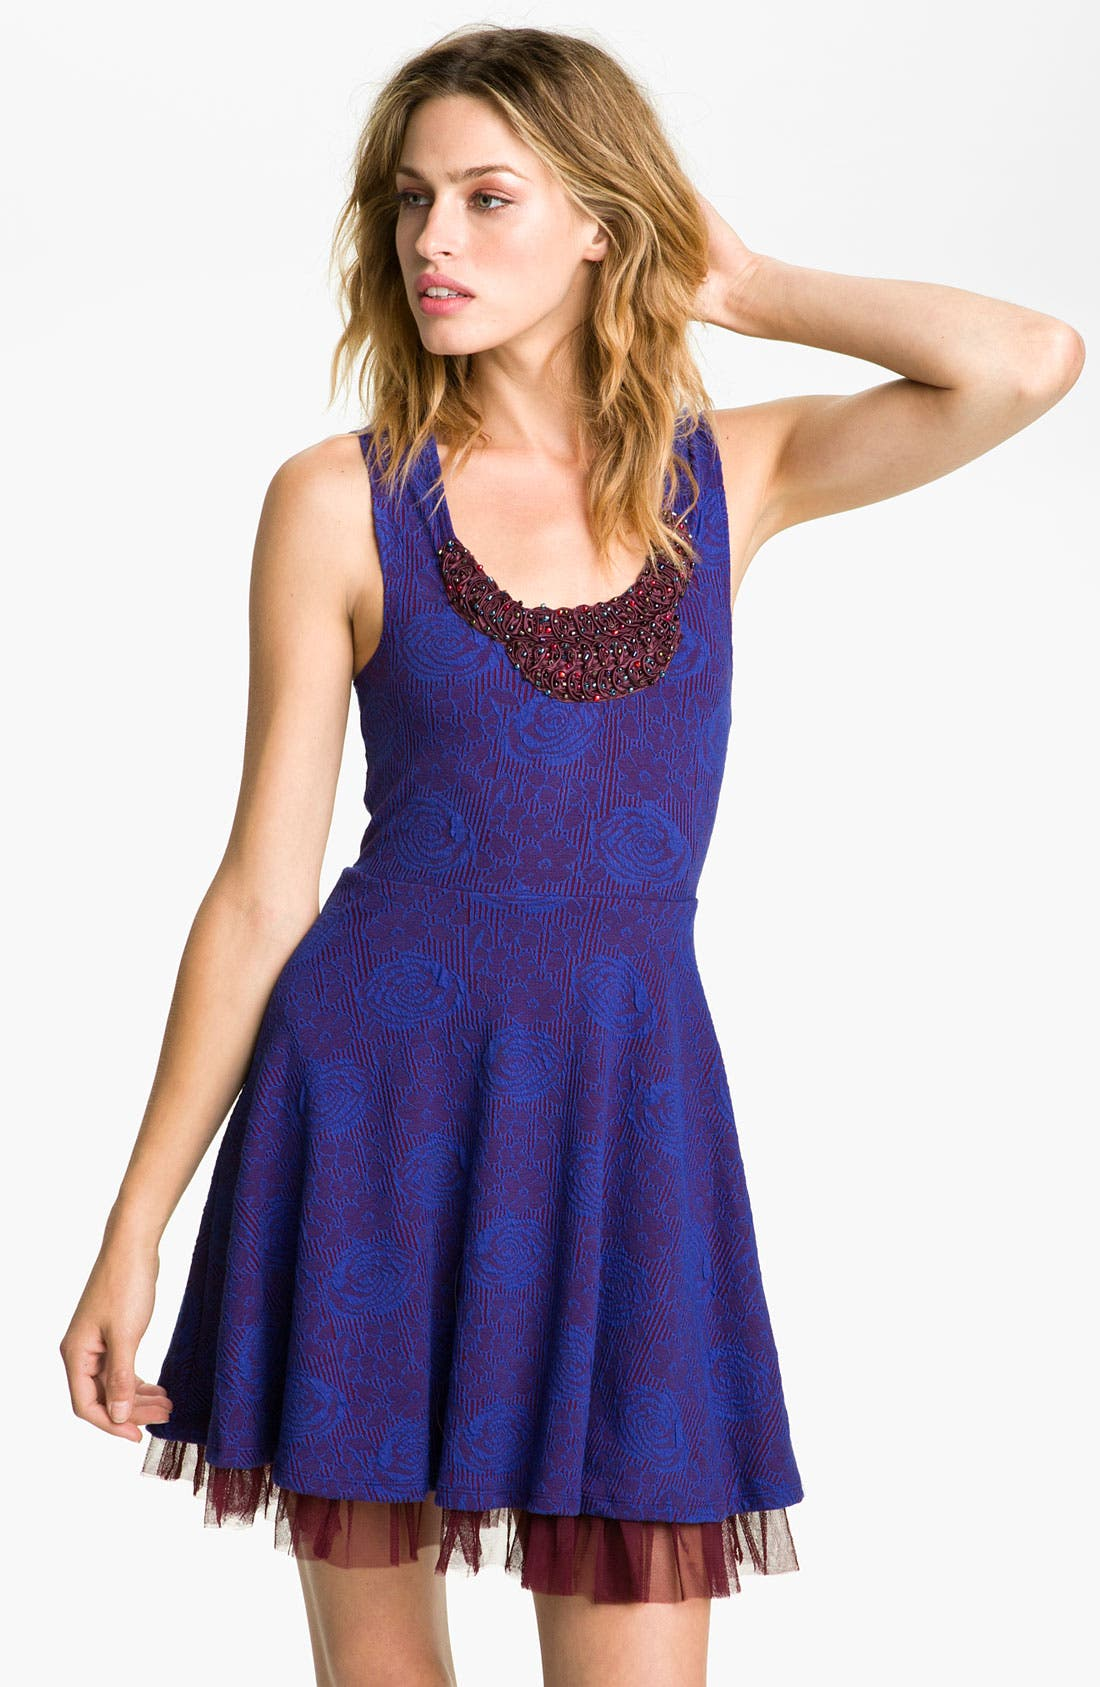 Main Image - Free People 'Rock Princess' Embellished Dress